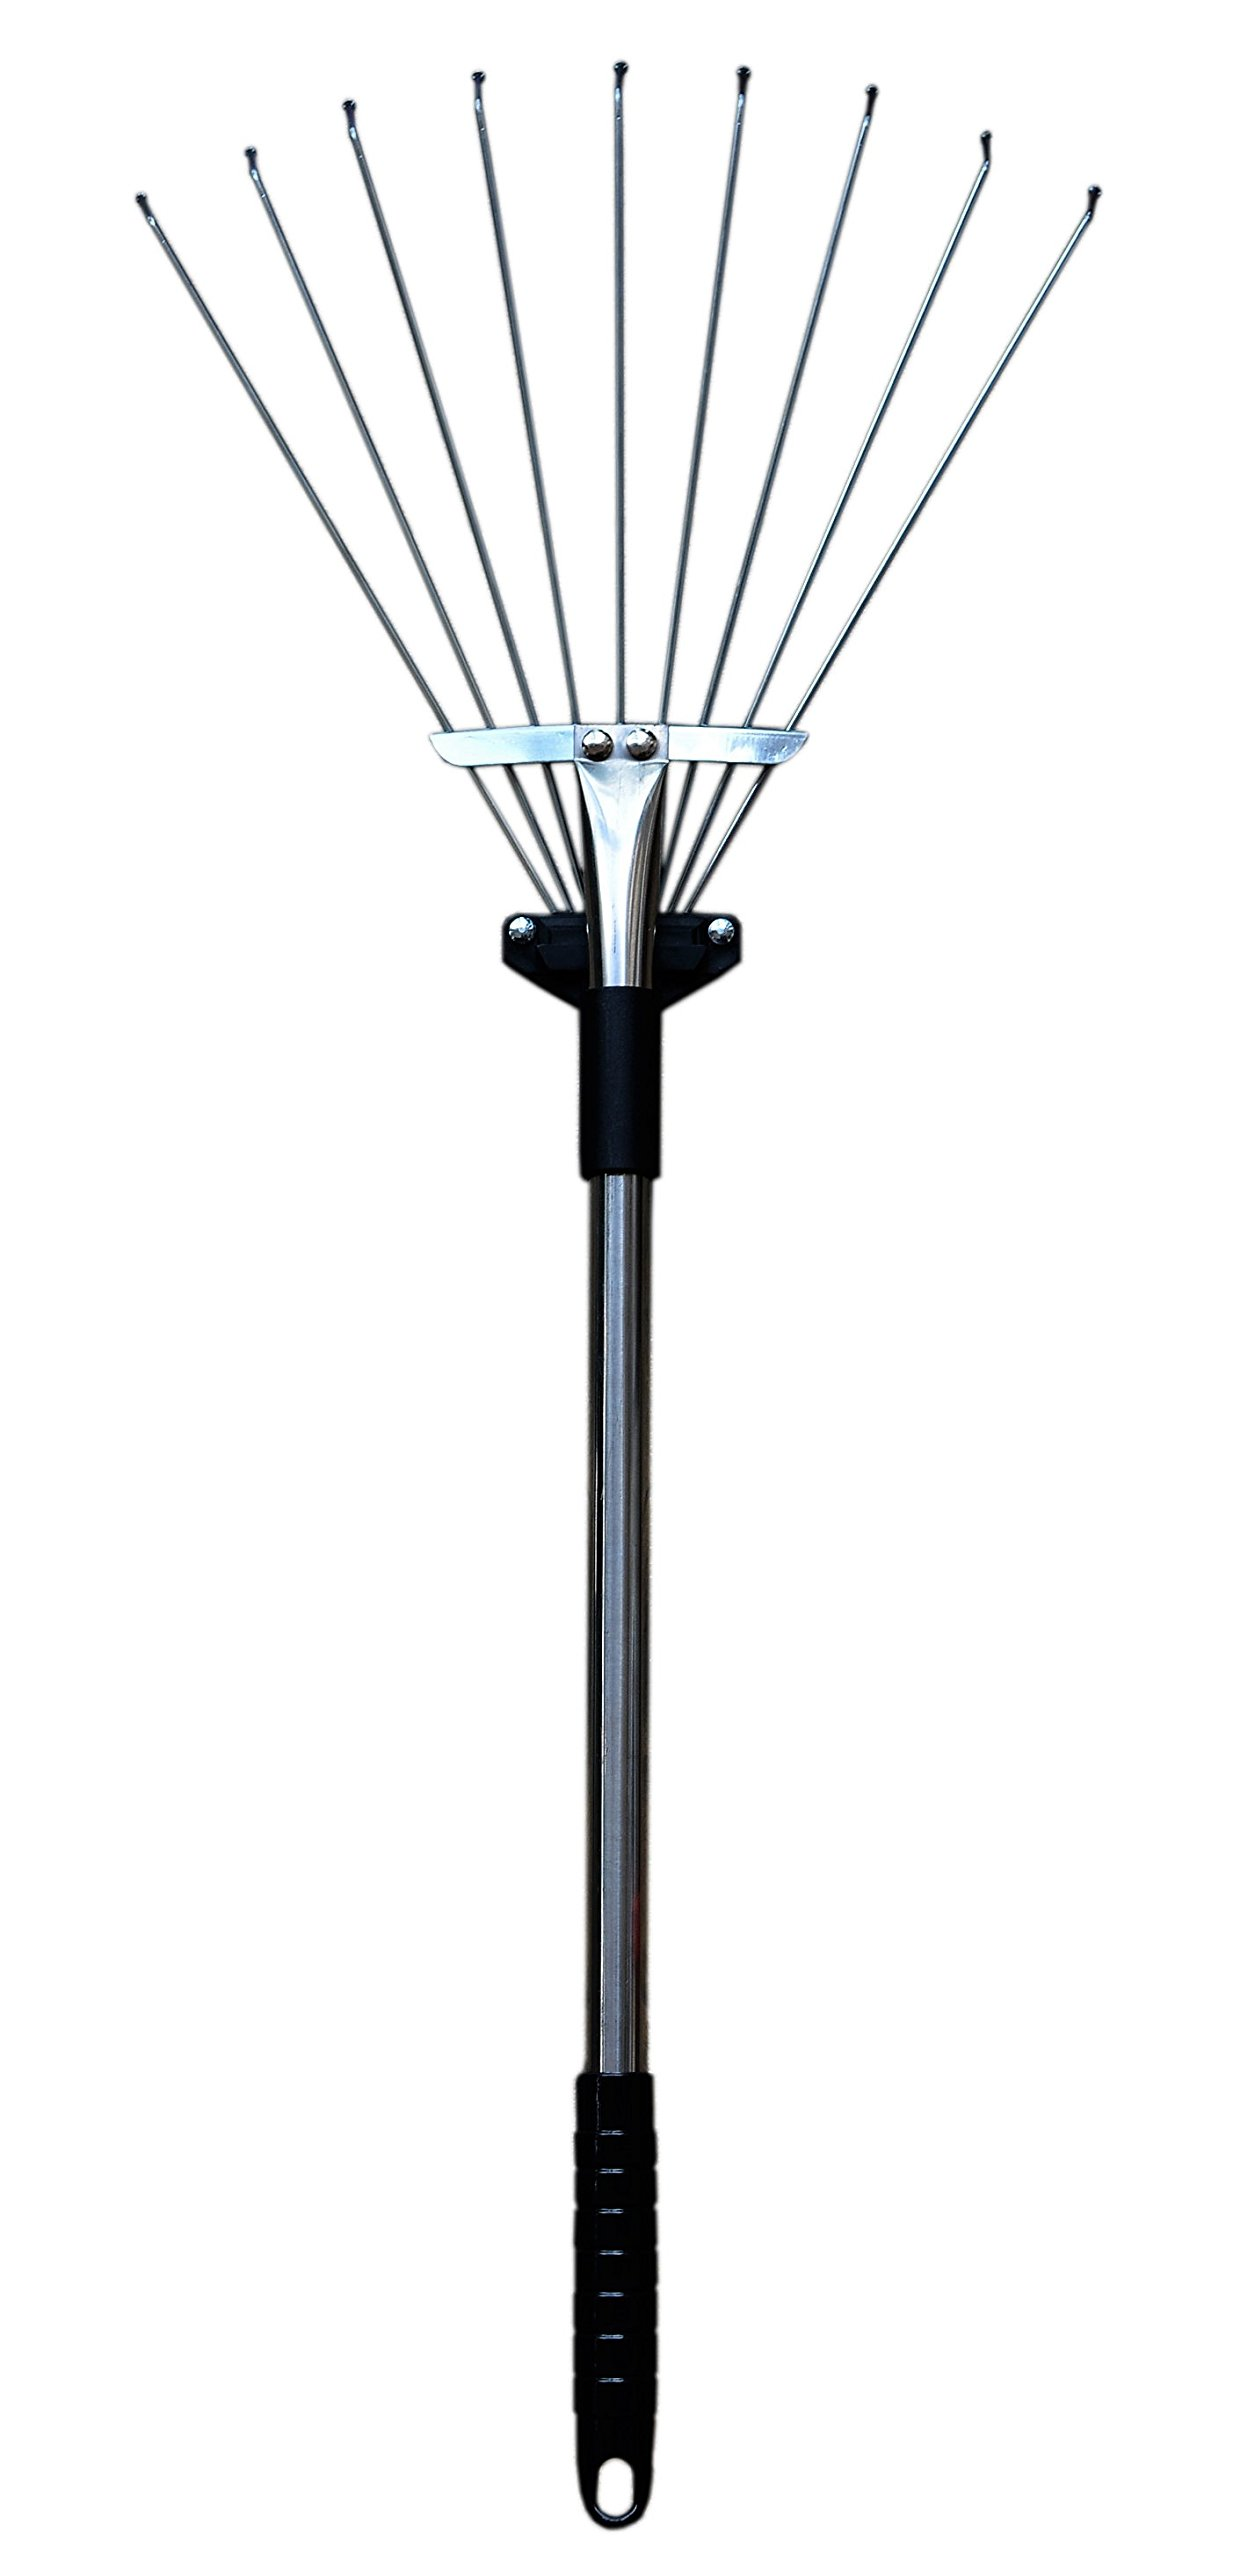 ZaoProteks ZP5802 Stainless Steel Garden Rake, Hay Rake, Lawn rake (Black Handle)